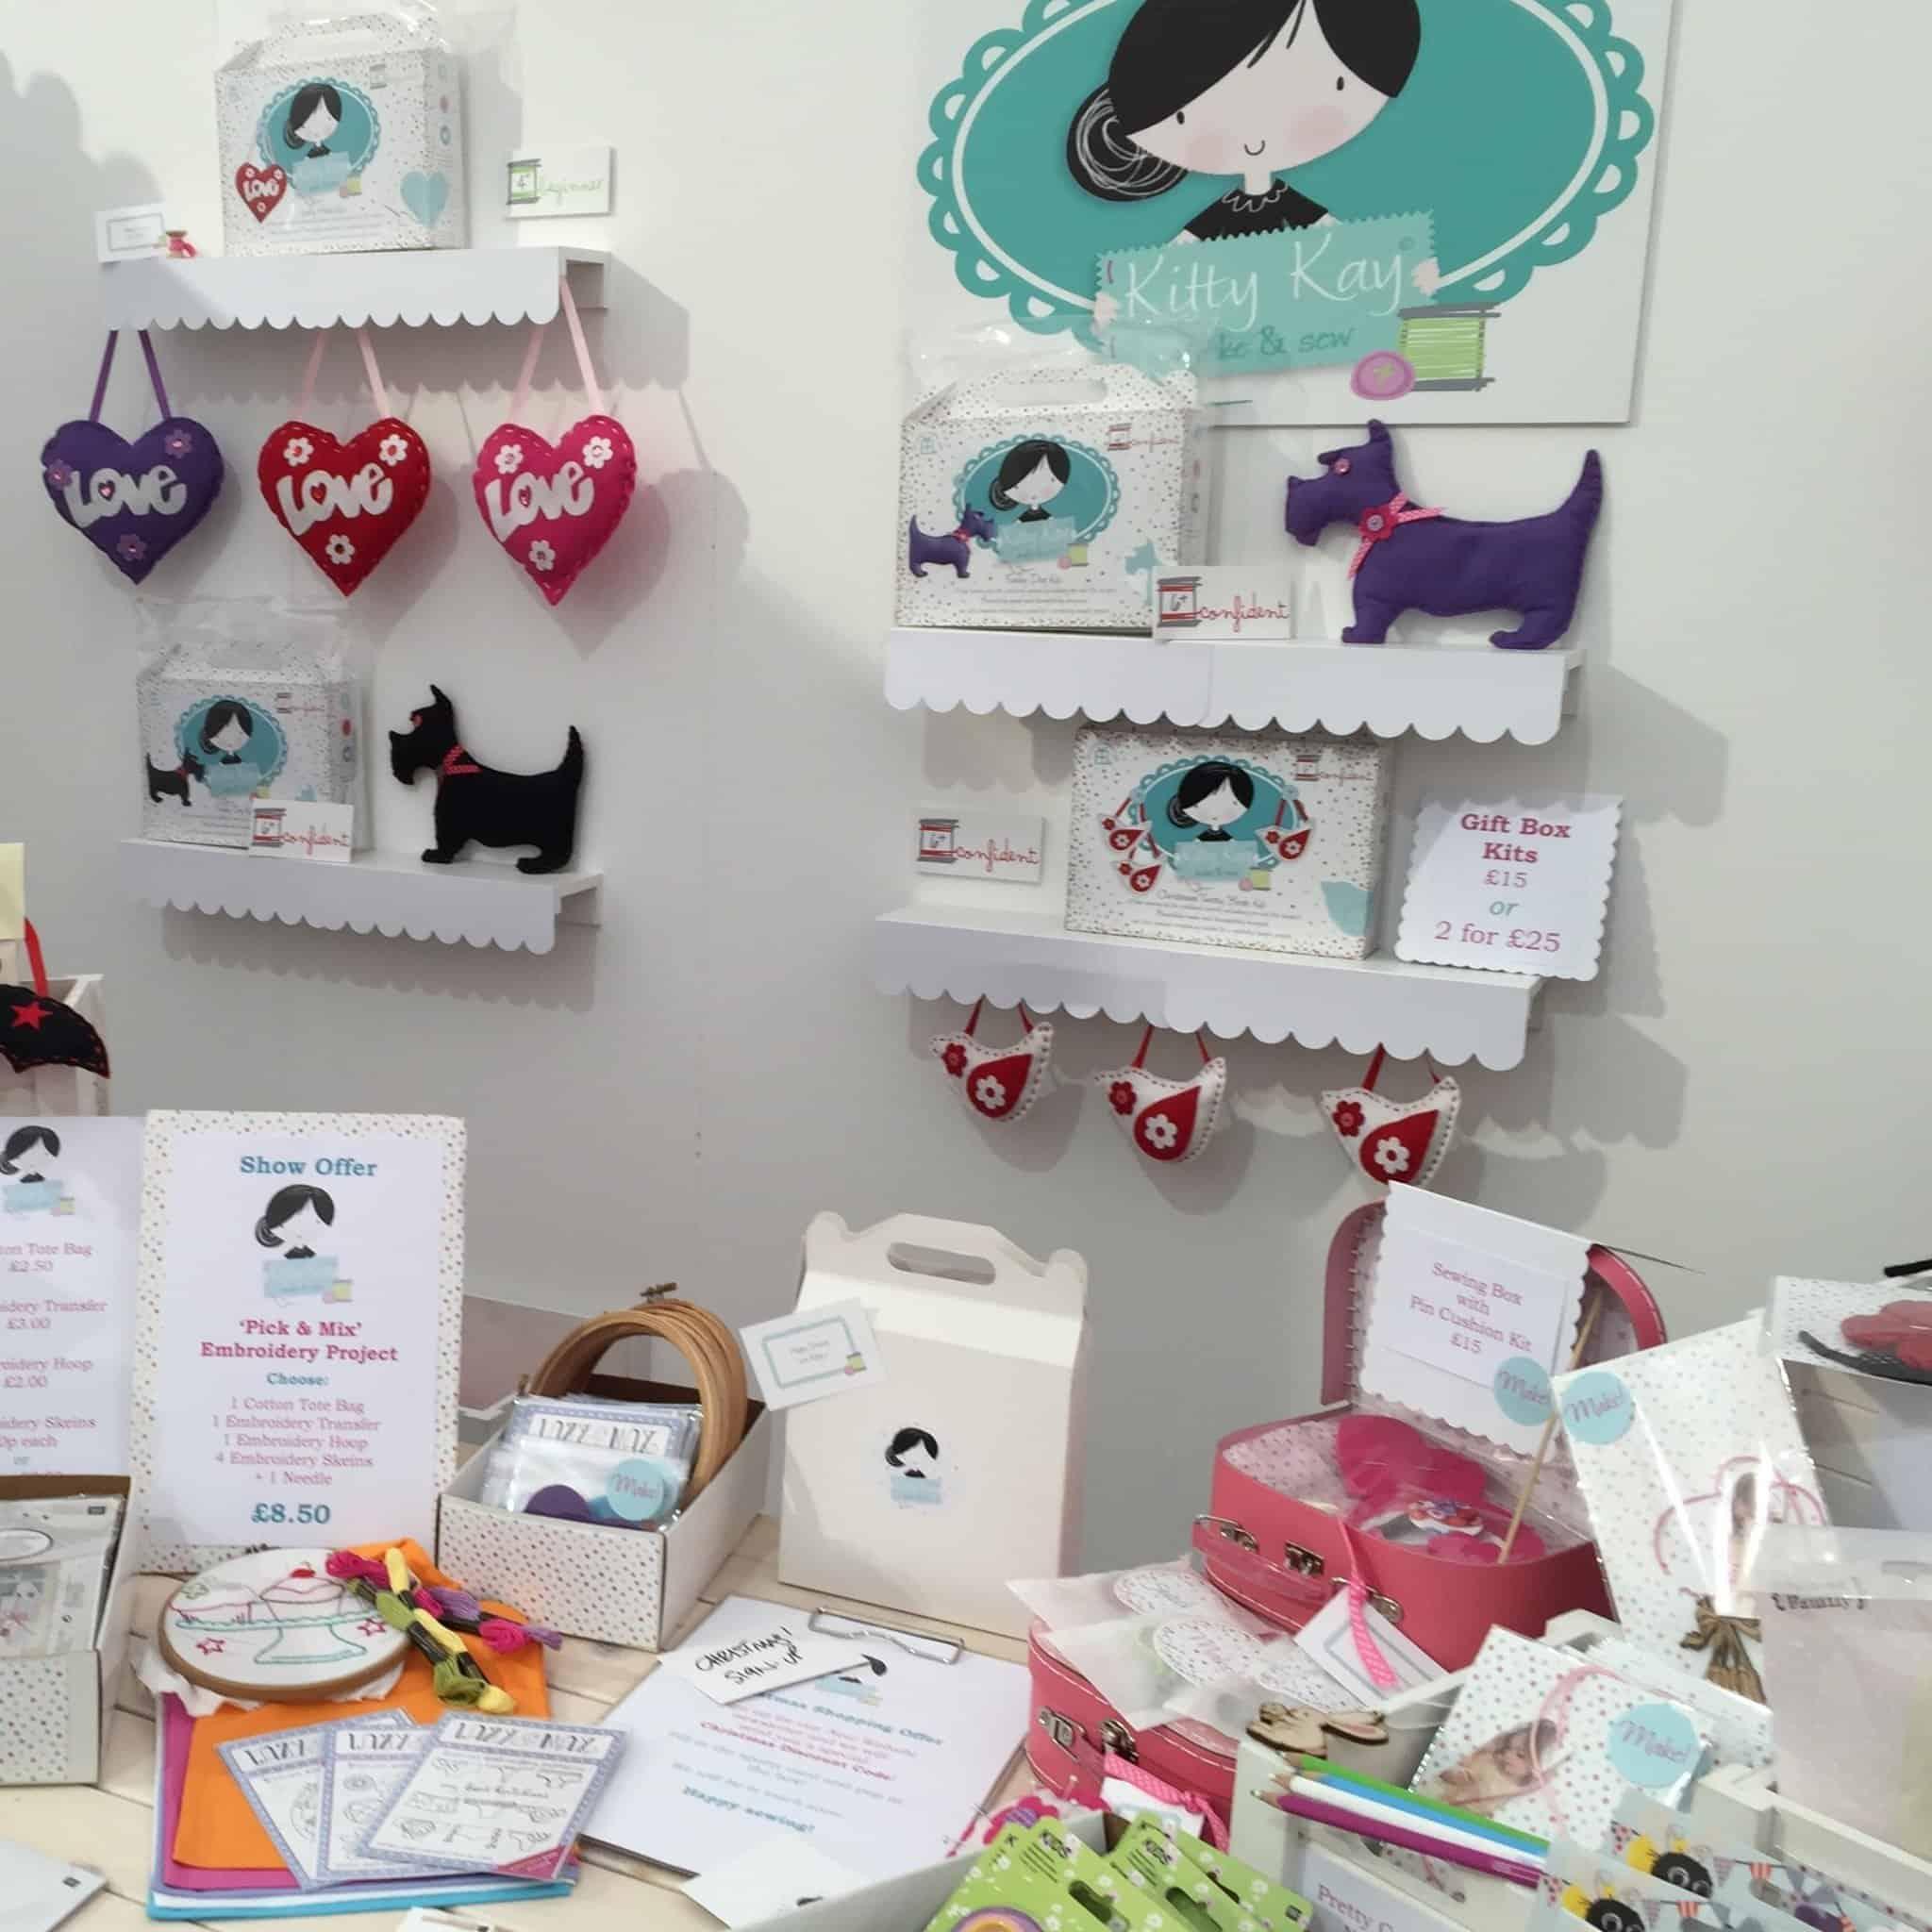 Kitty Kay Kids Craft Kits at The Handmade Fair